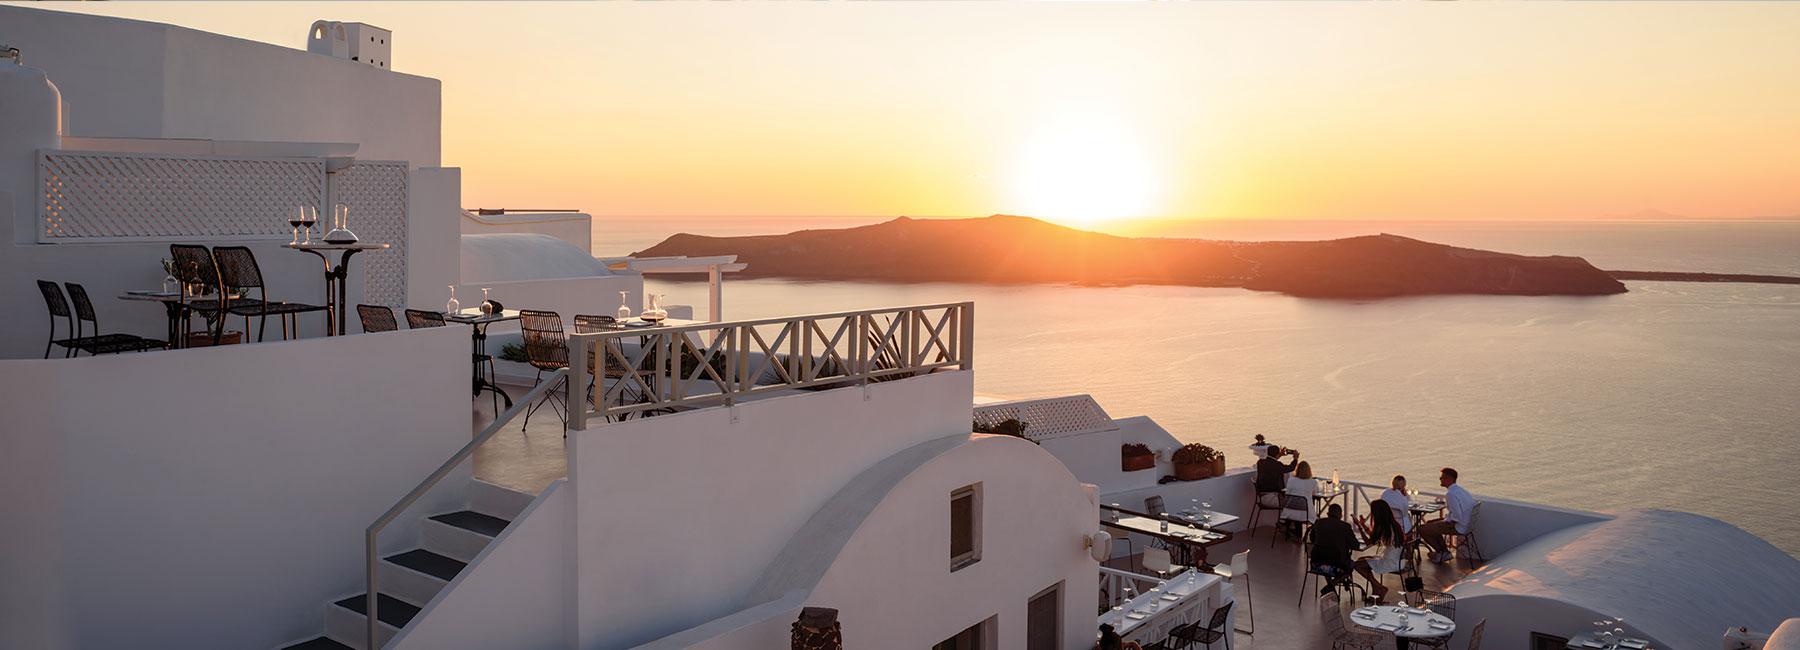 The Wine Bar full terrace view